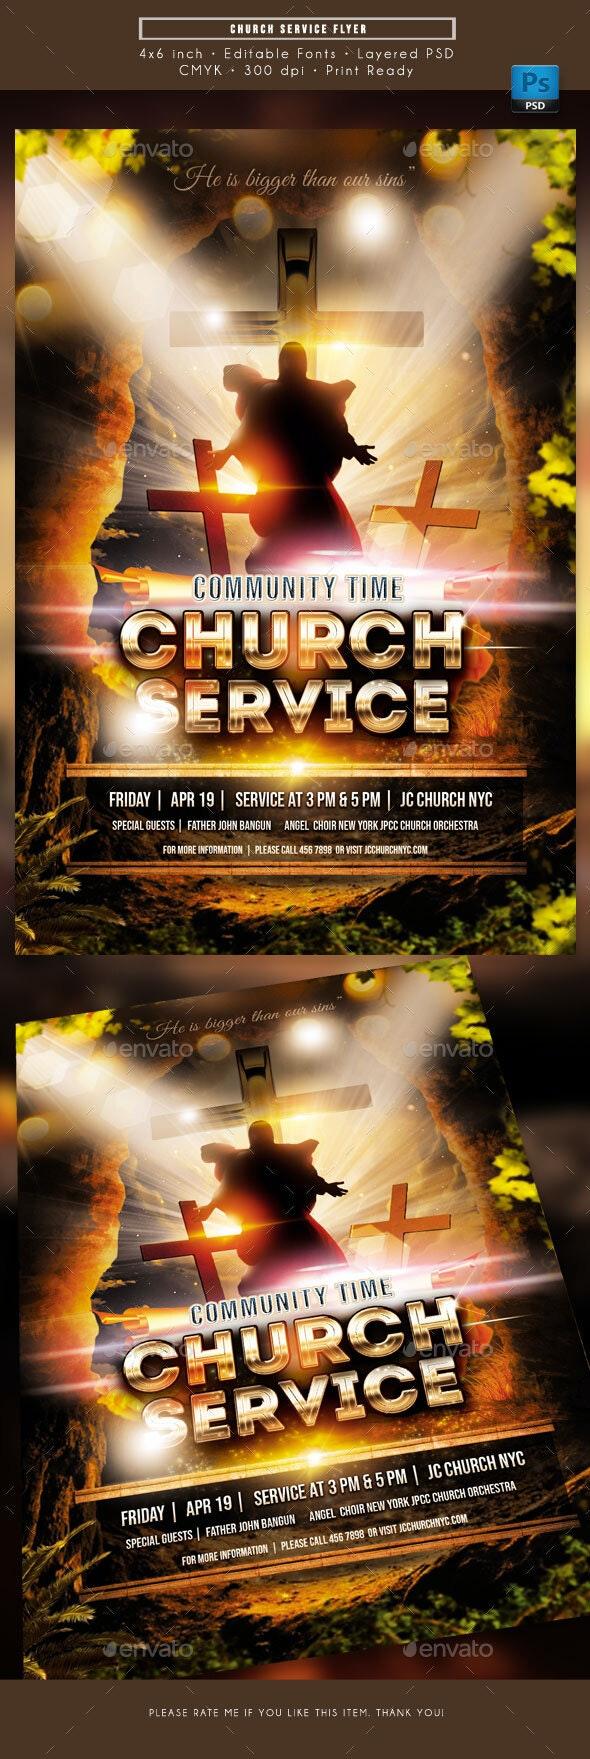 Church Service Worship Flyer - Church Flyers